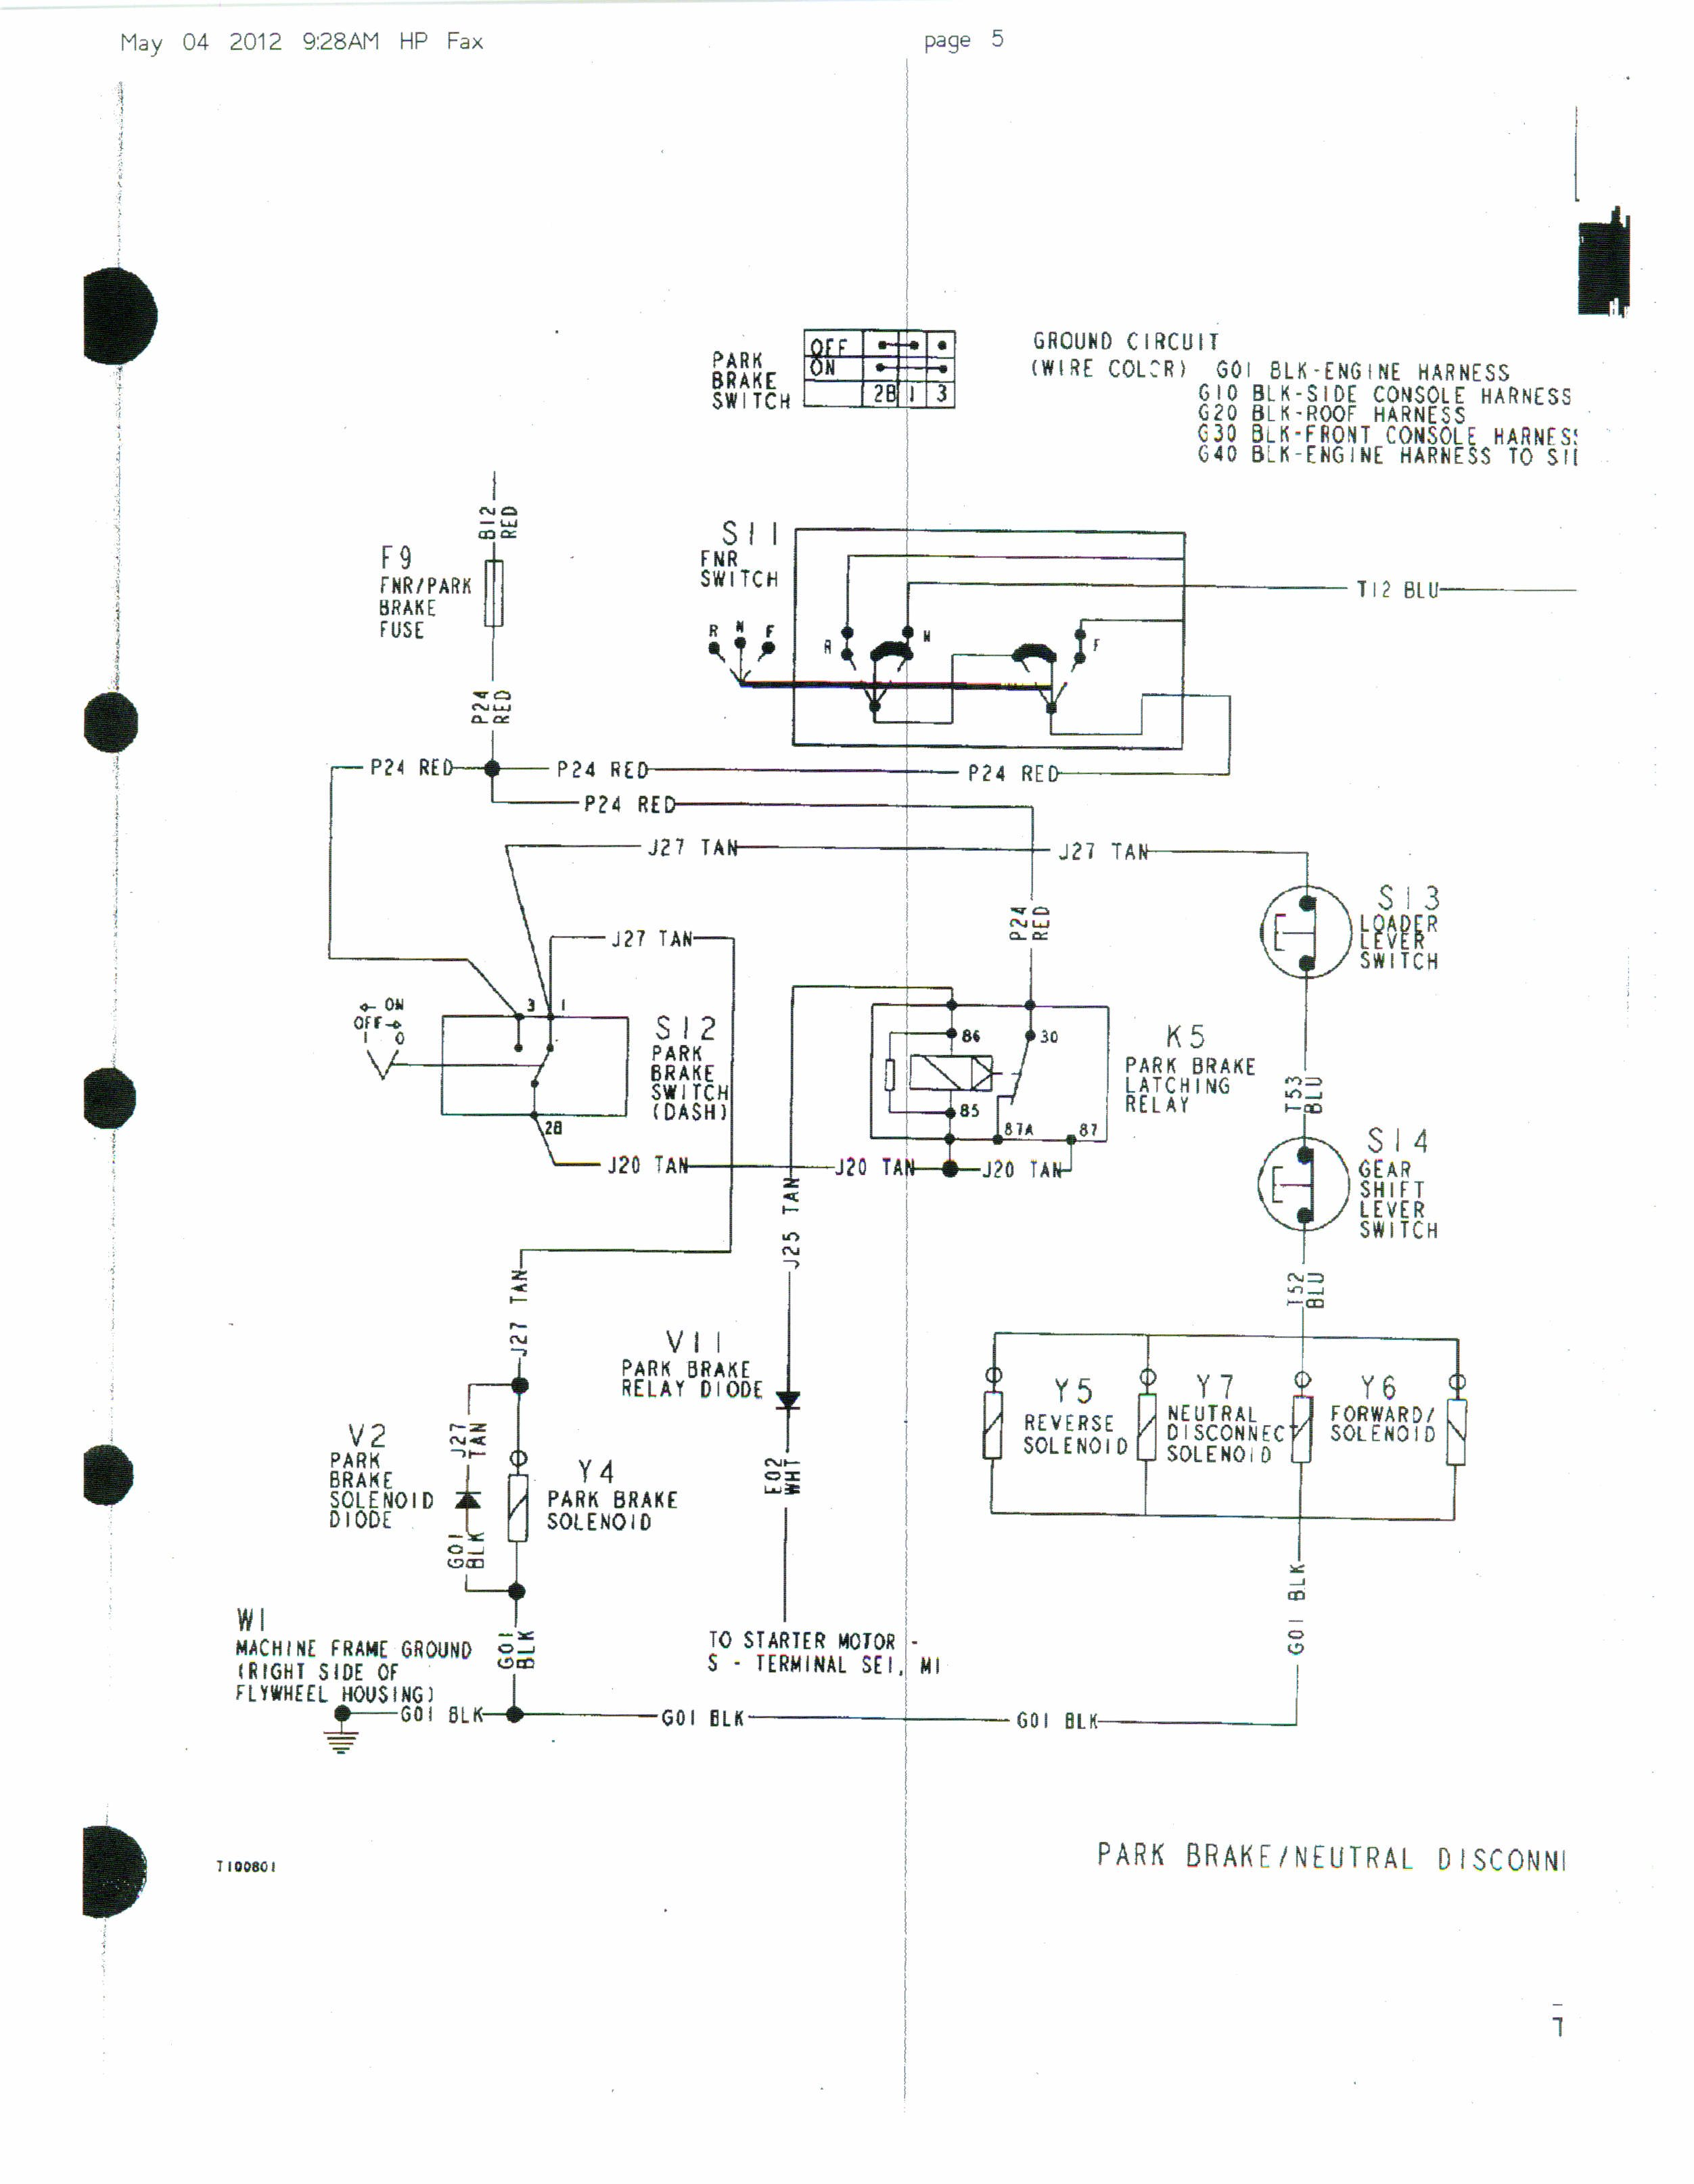 SA_2012] John Deere 310 Backhoe Parts Diagram John Deere 310 Backhoe Wiring  Wiring DiagramIstic Venet Wigeg Mohammedshrine Librar Wiring 101